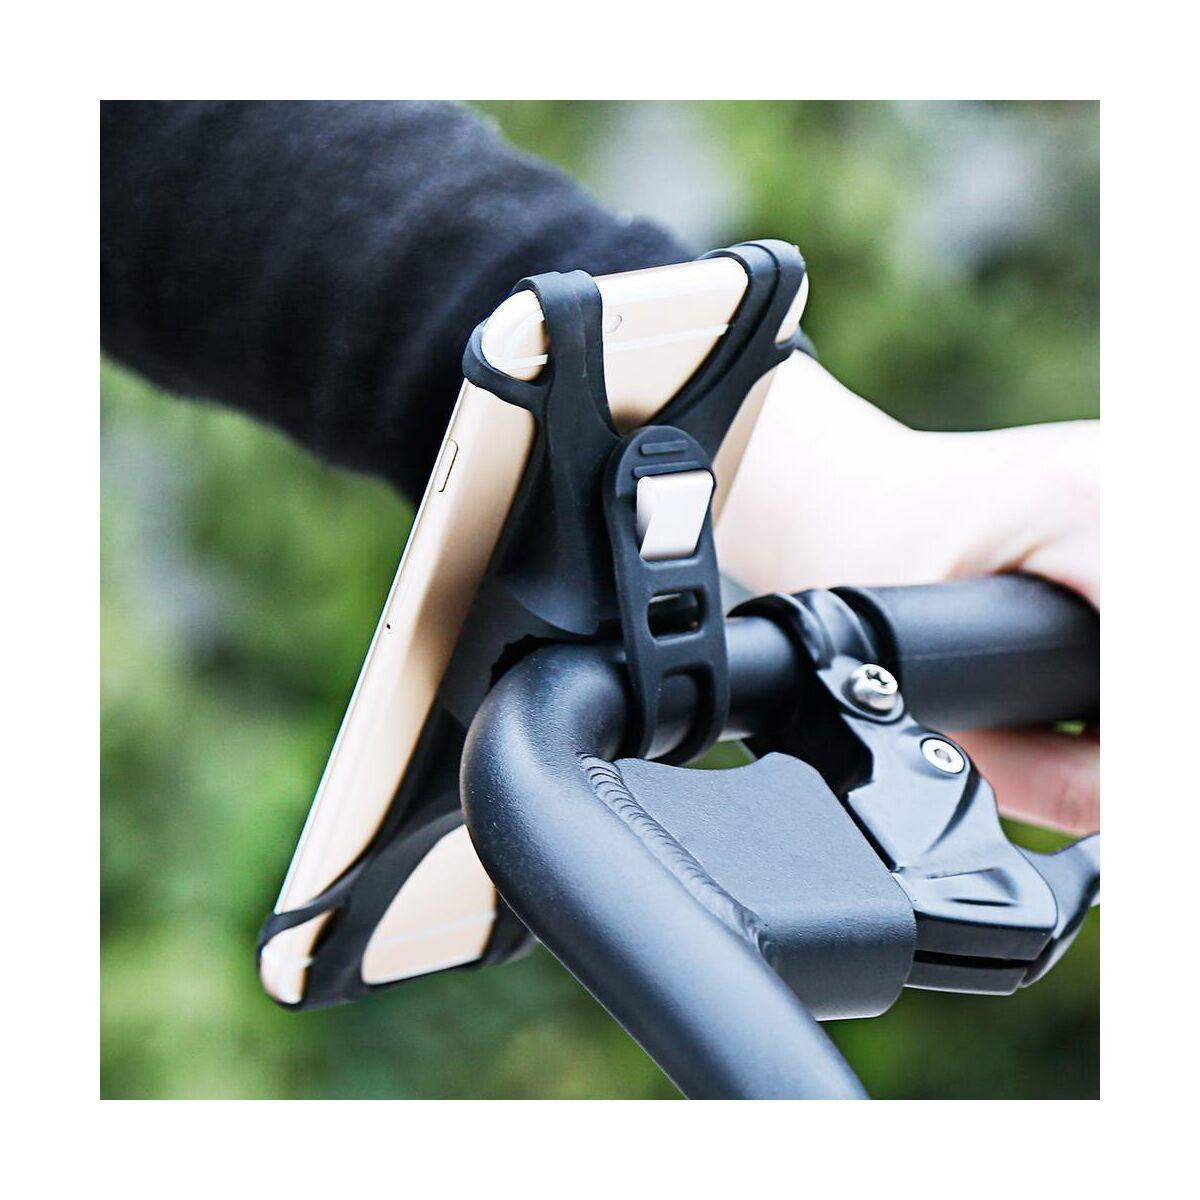 Baseus Miracle mobiltelefontartó, biciklire, fekete (SUMIR-BY01)